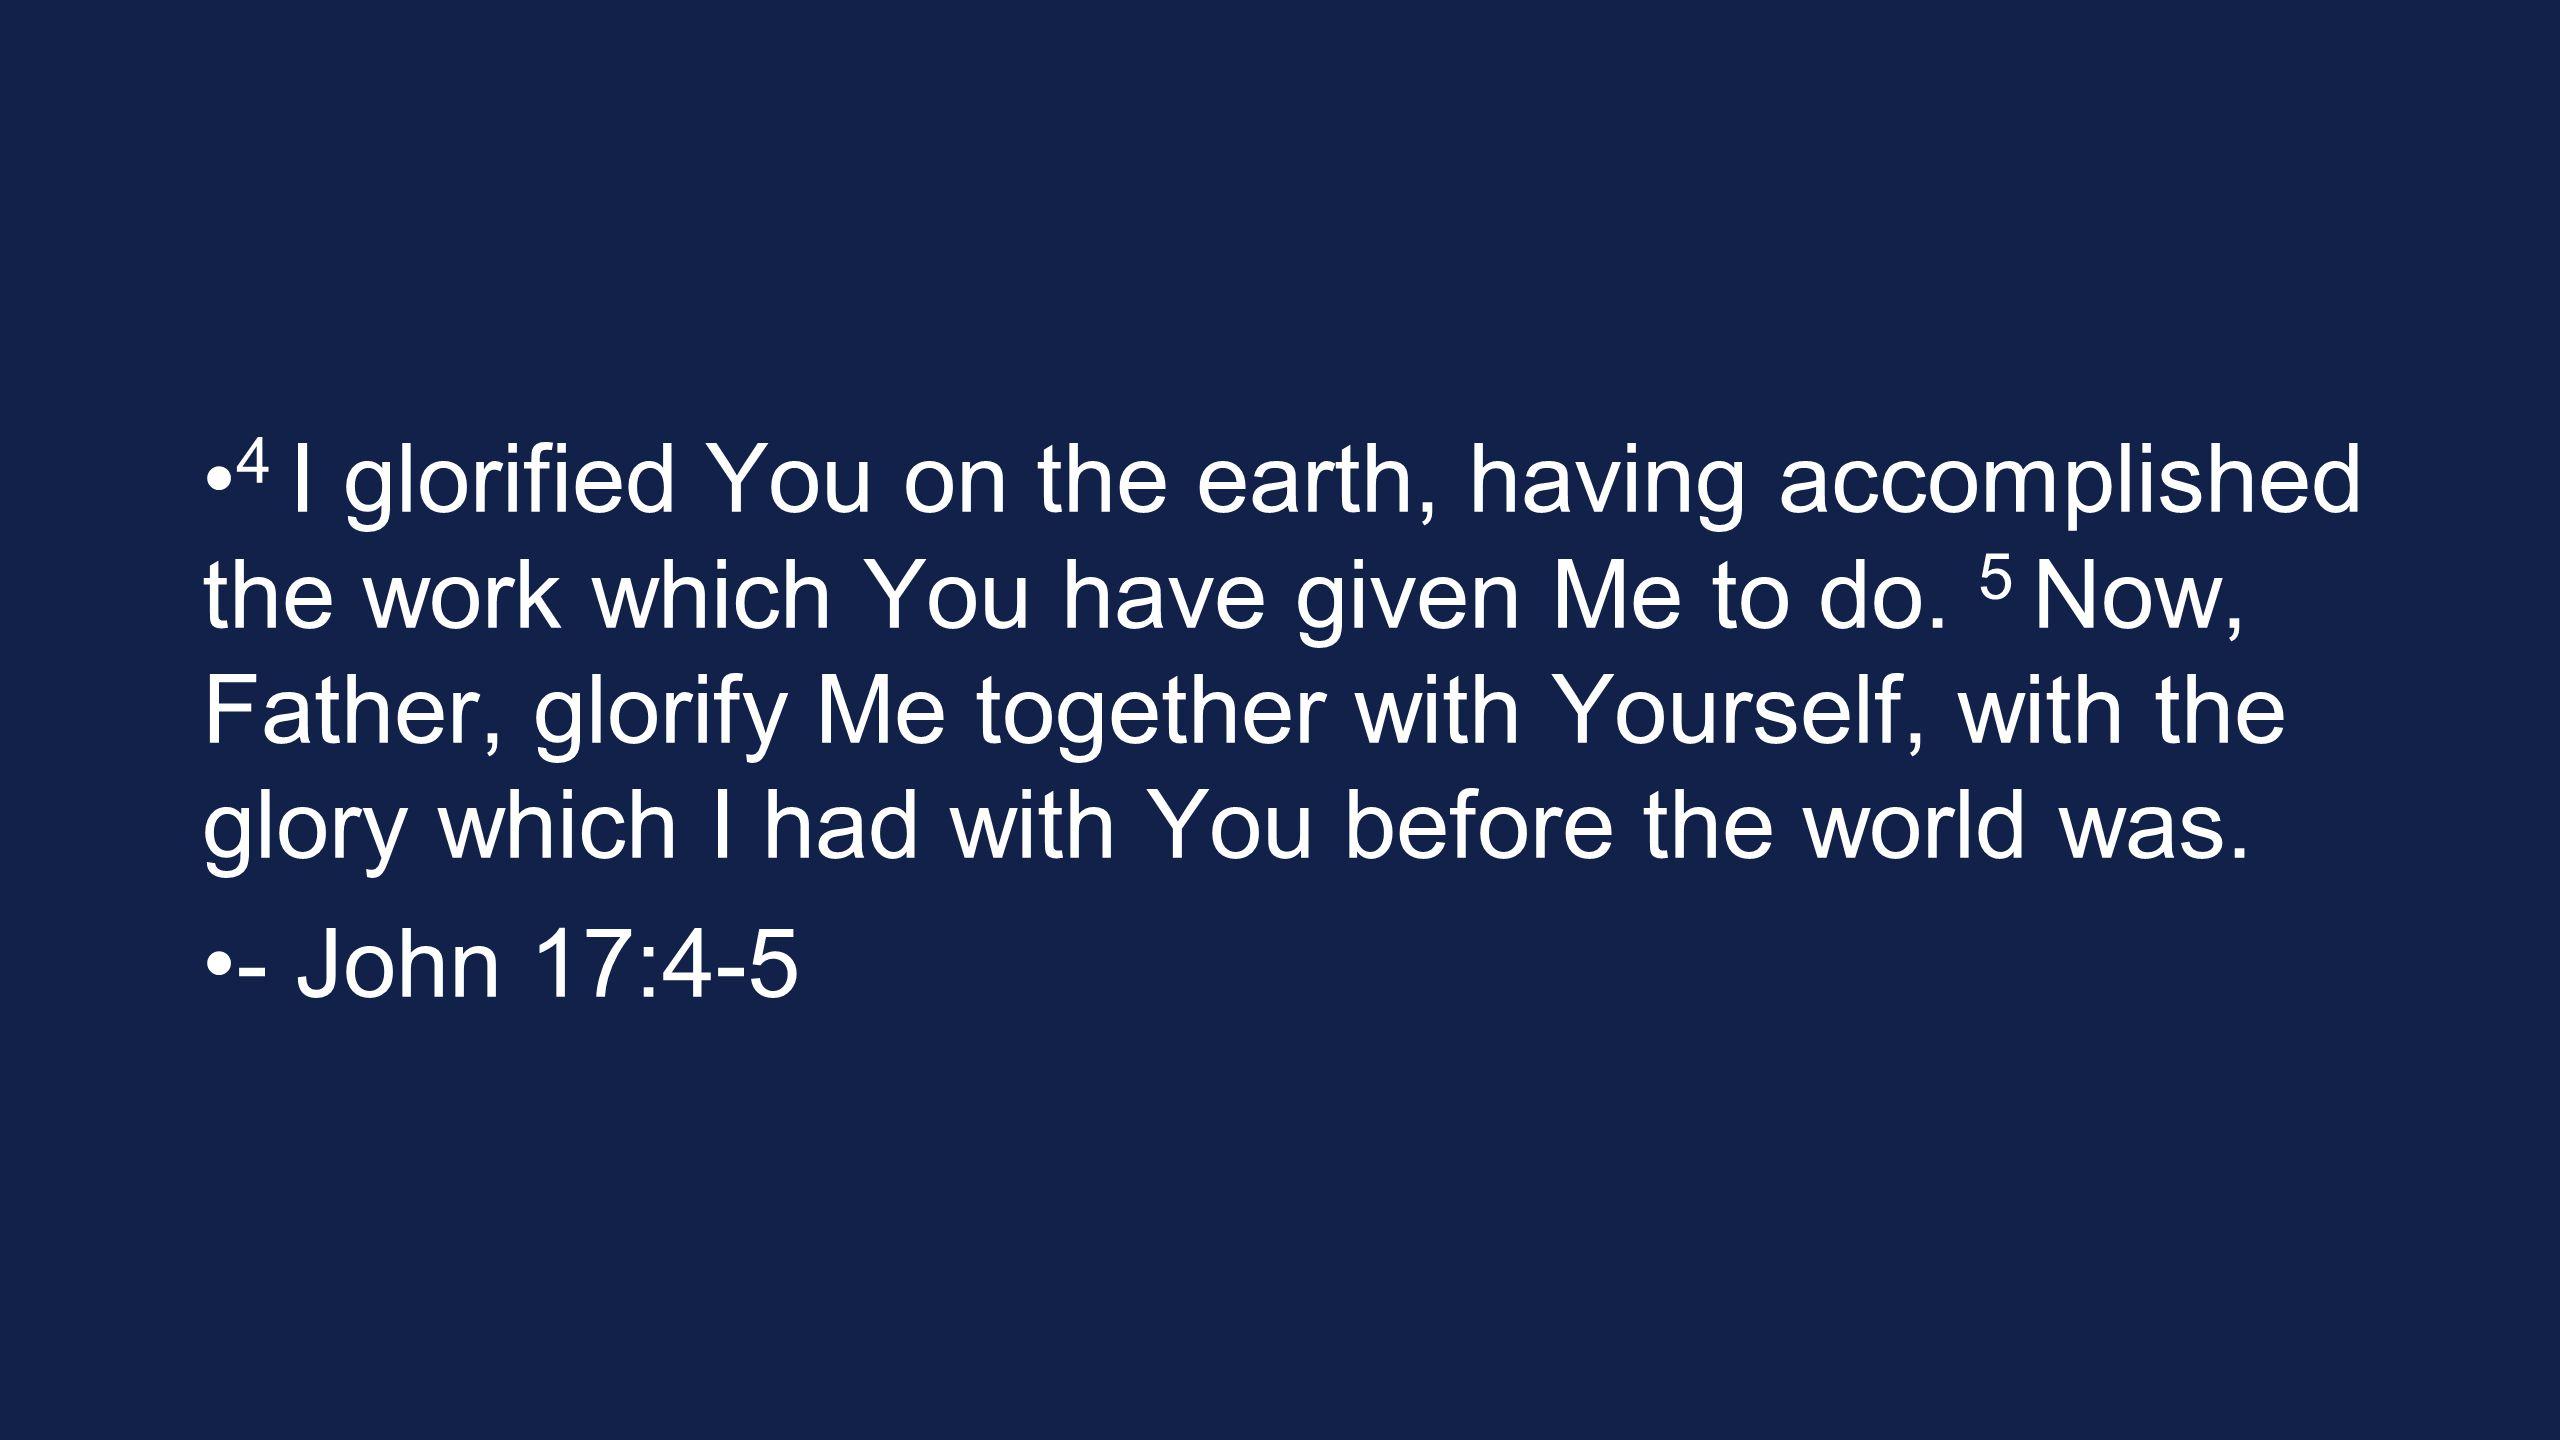 Prayer for Apostles